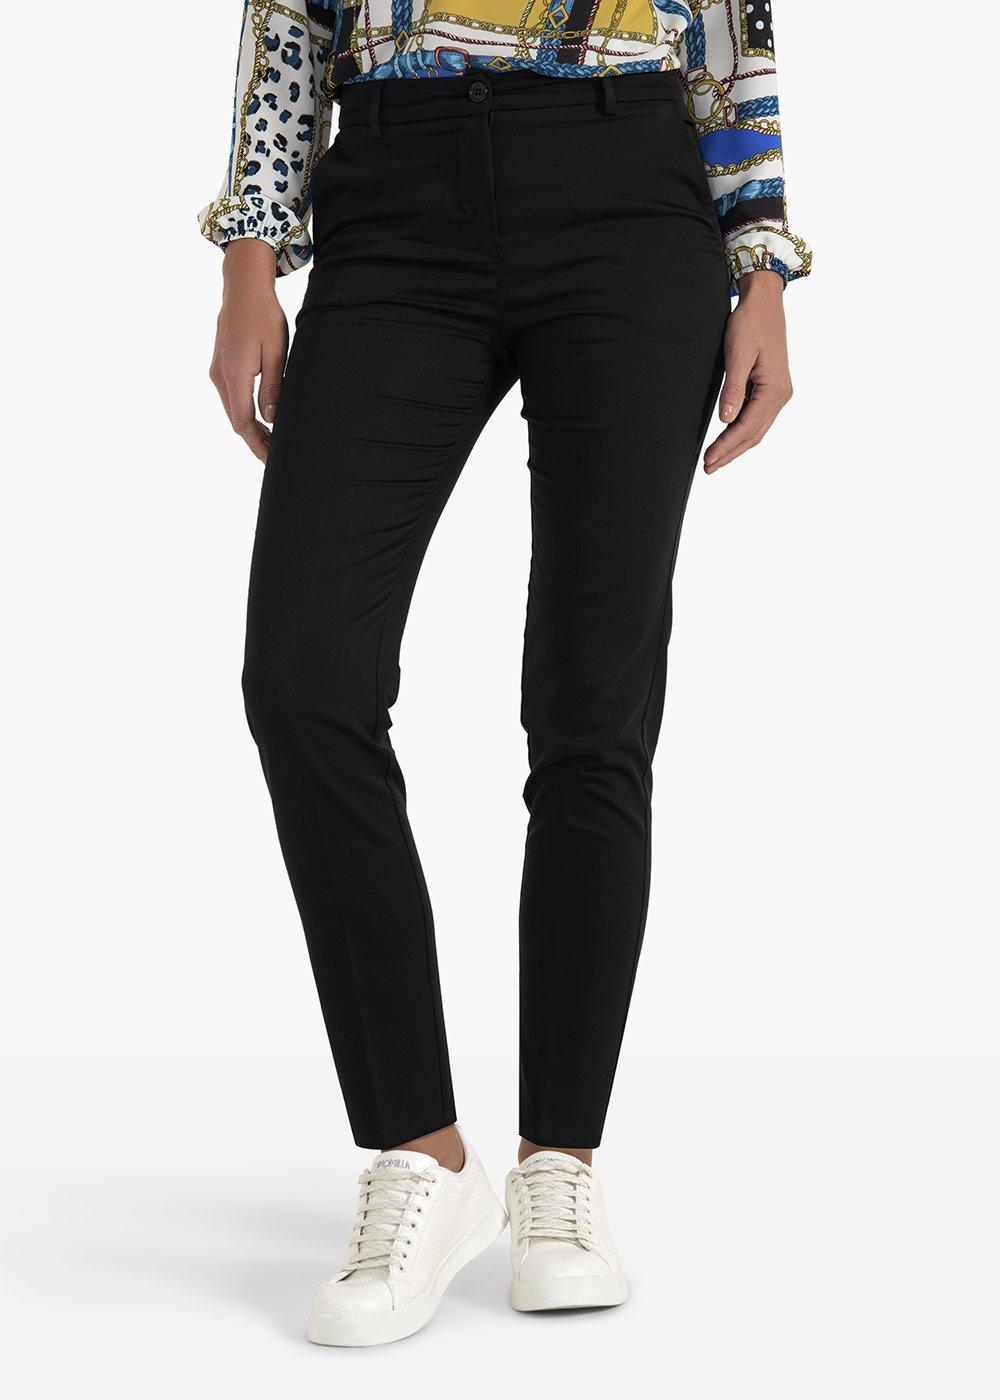 Clair pants Hunter  model in polycotton - Black - Woman